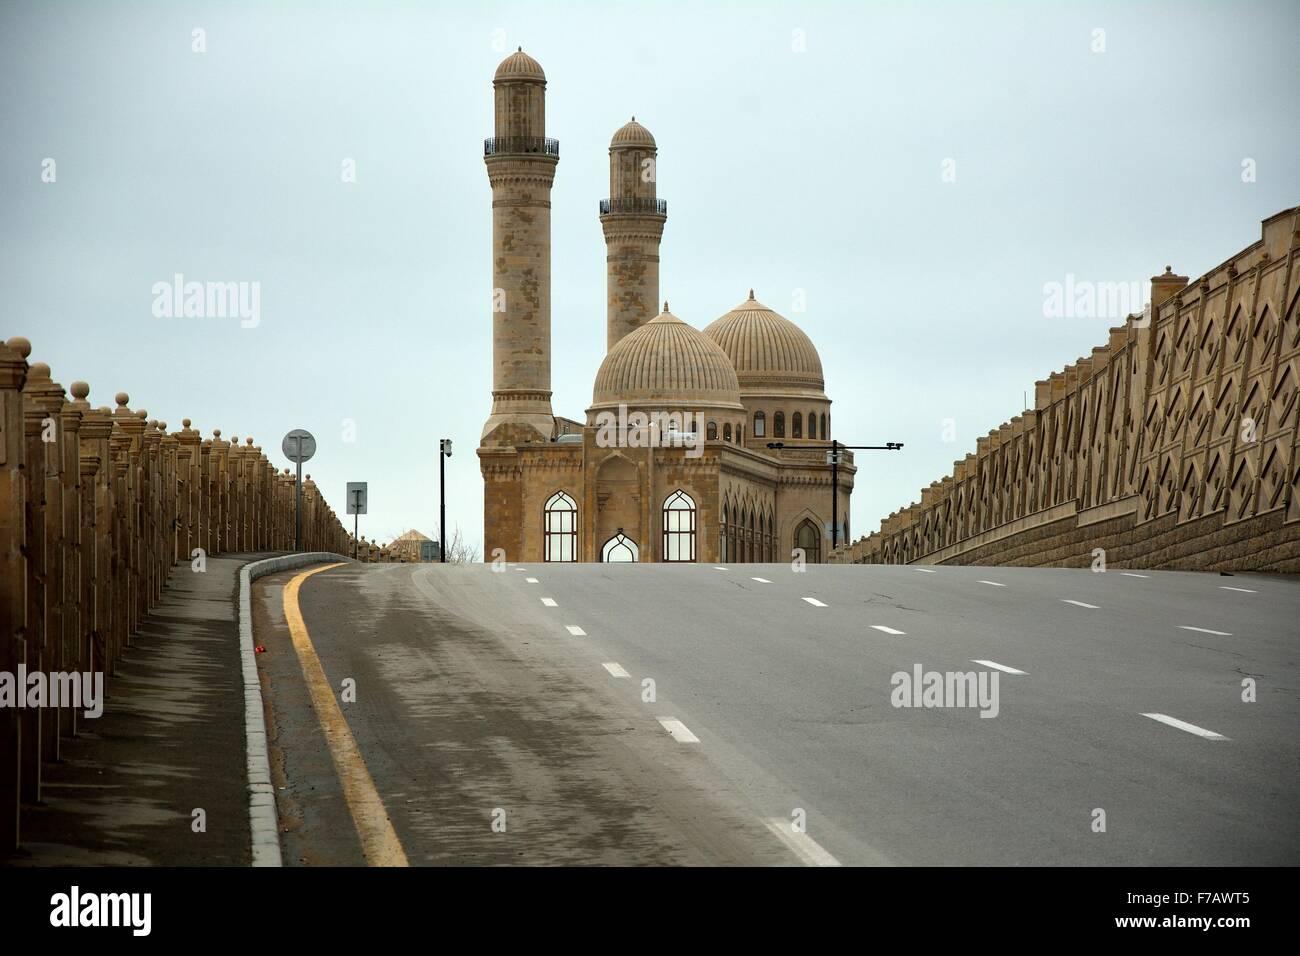 Road leading to Bibi-heybat mosque just outside Baku, capital of Azerbaijan - Stock Image